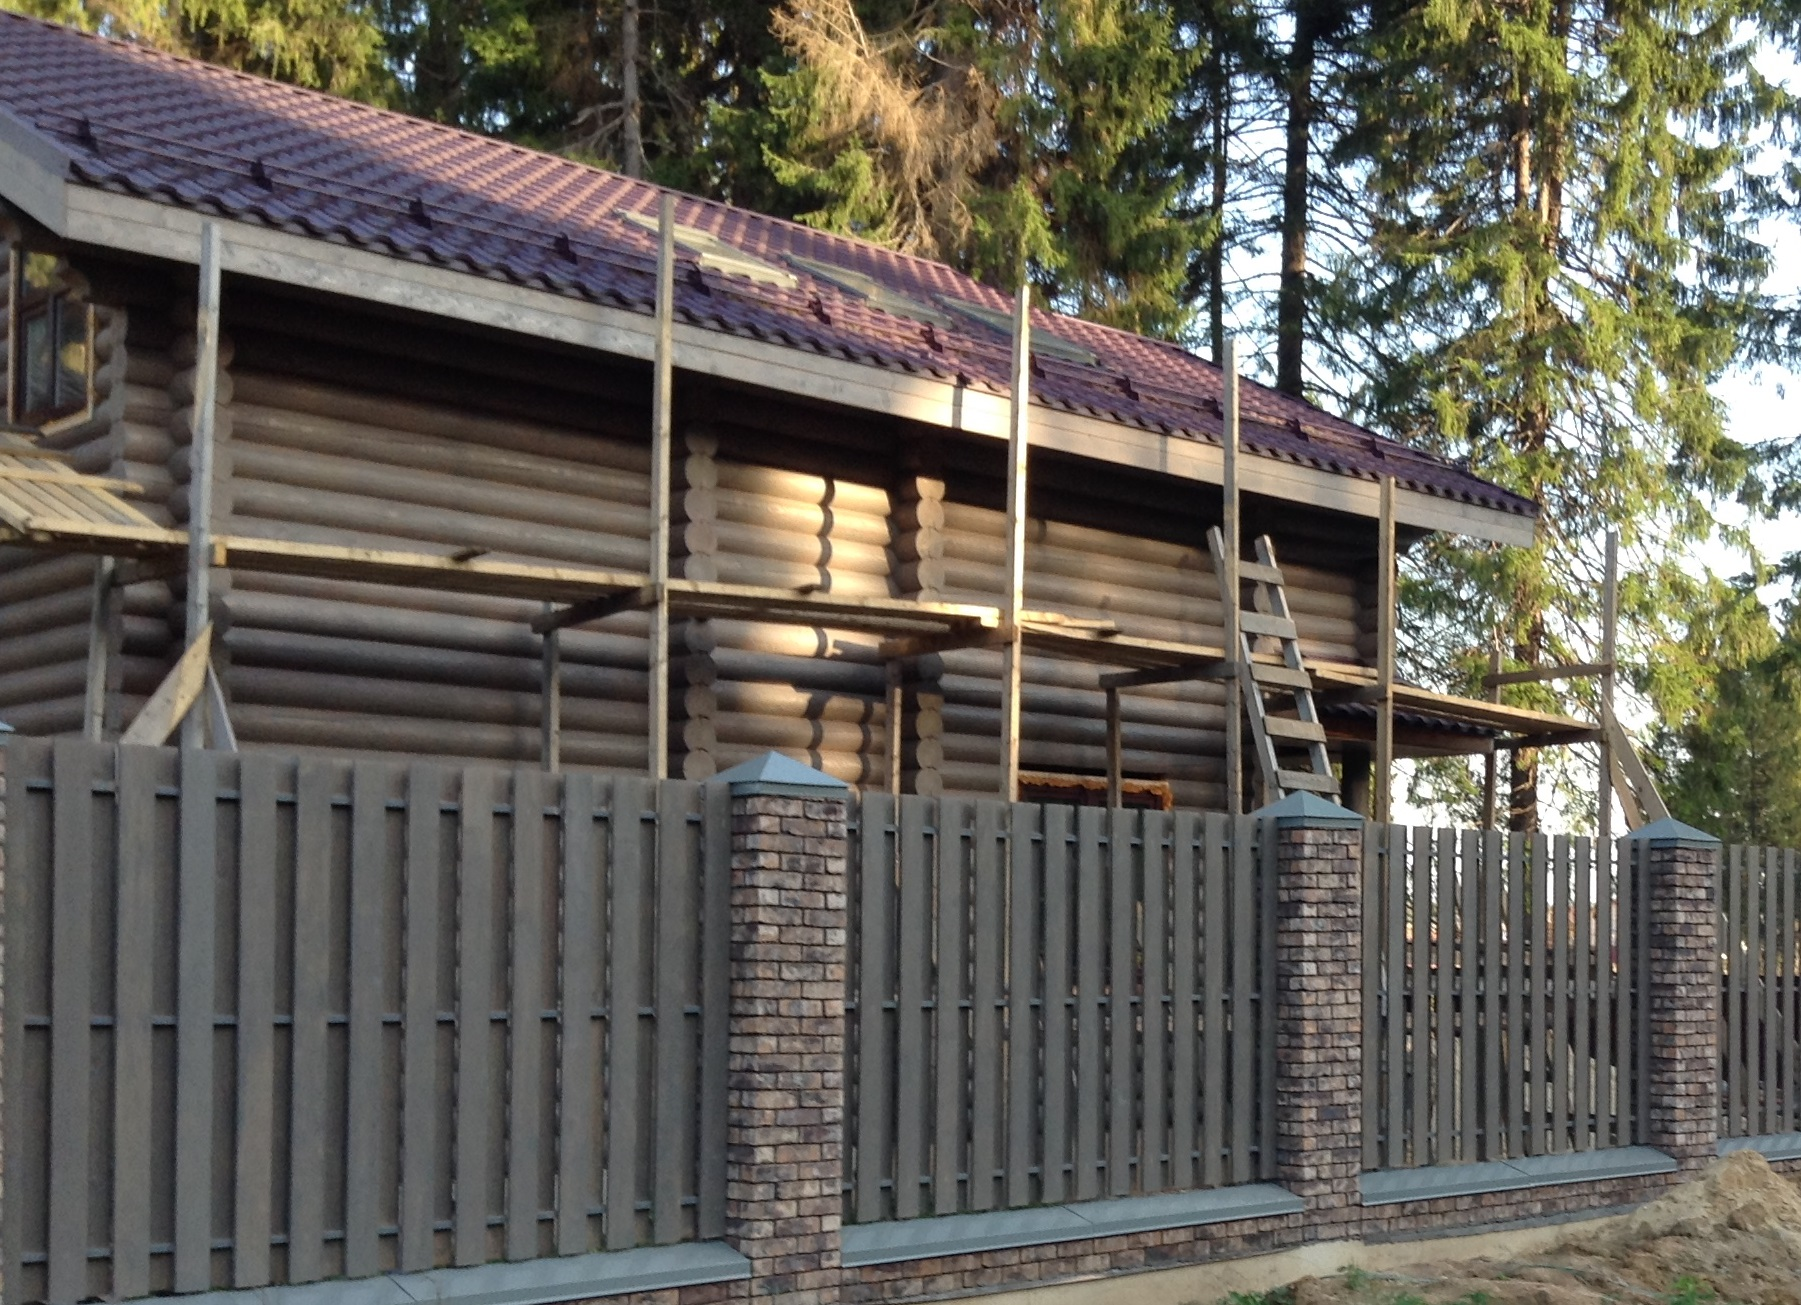 Забор со столбами из кирпича вокруг дома